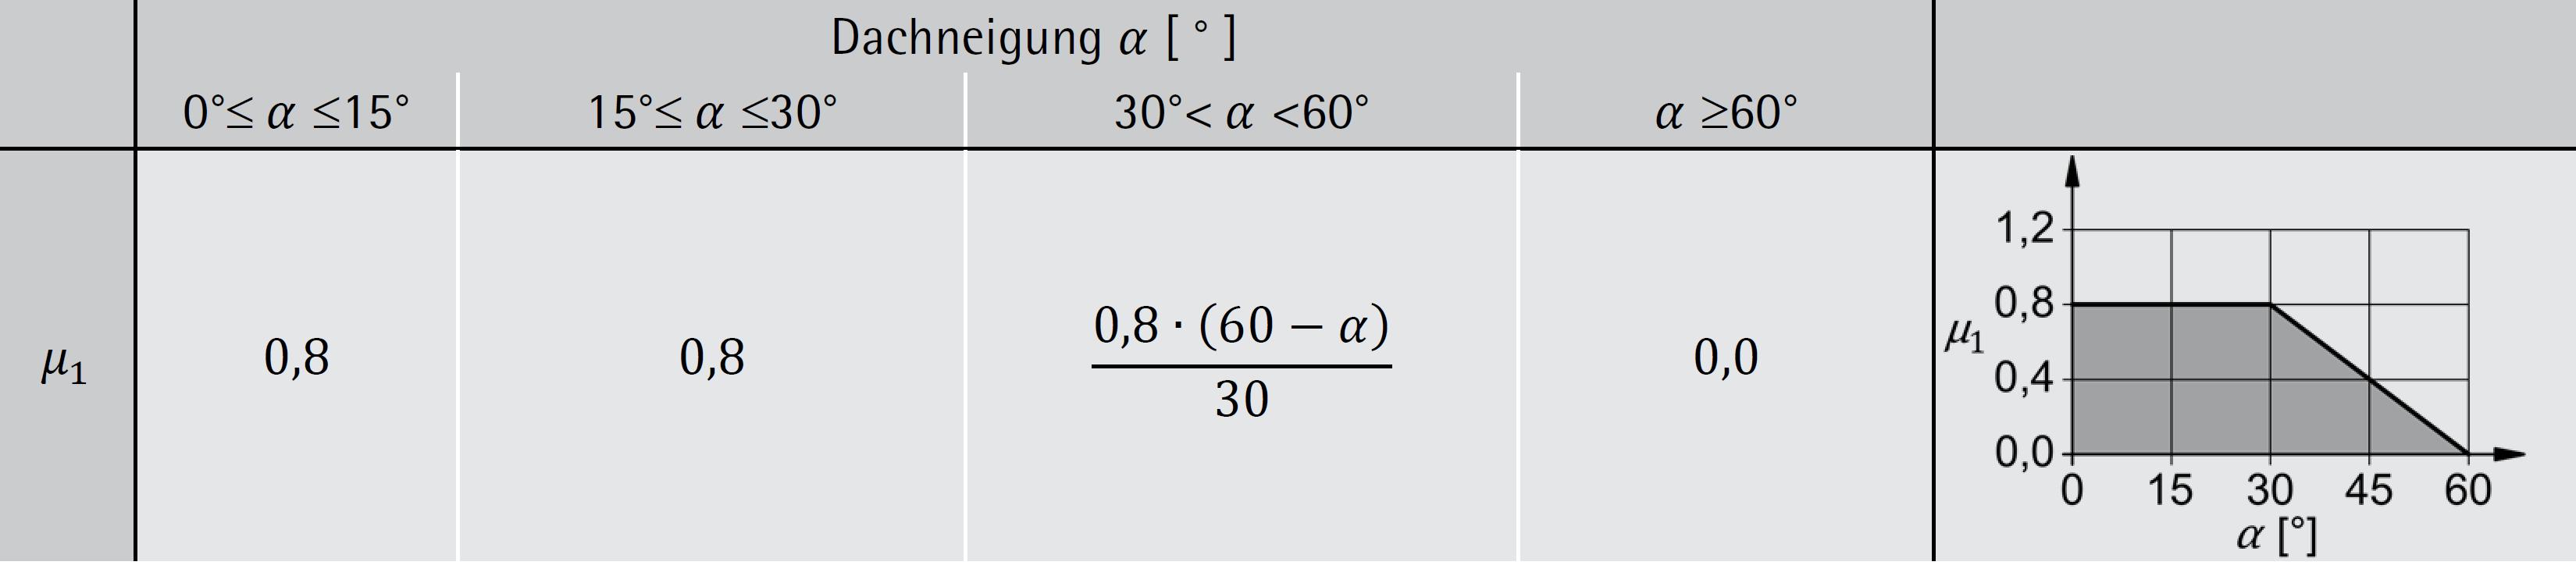 Formbeiwerte für Dächer – ÖNORM B 1991-1-3